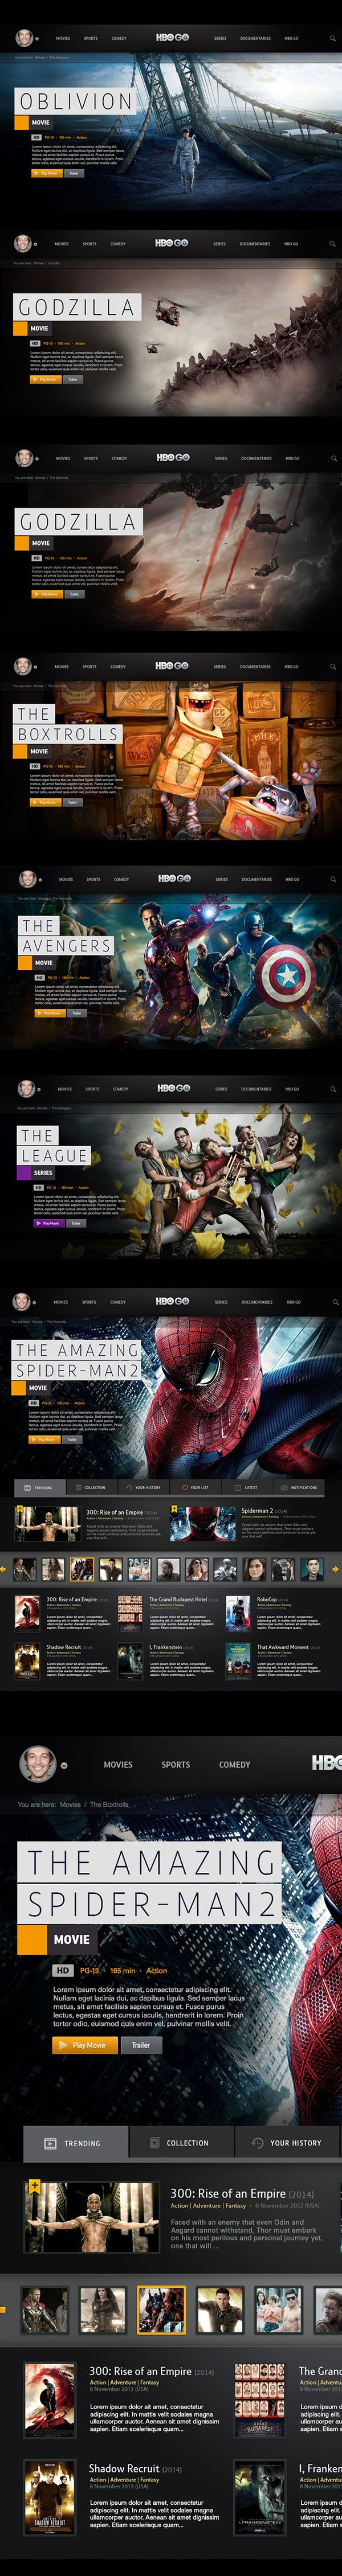 HBO GO : Interactive on Behance  | web design inspiration | digital media arts college | www.dmac.edu | 561.391.1148